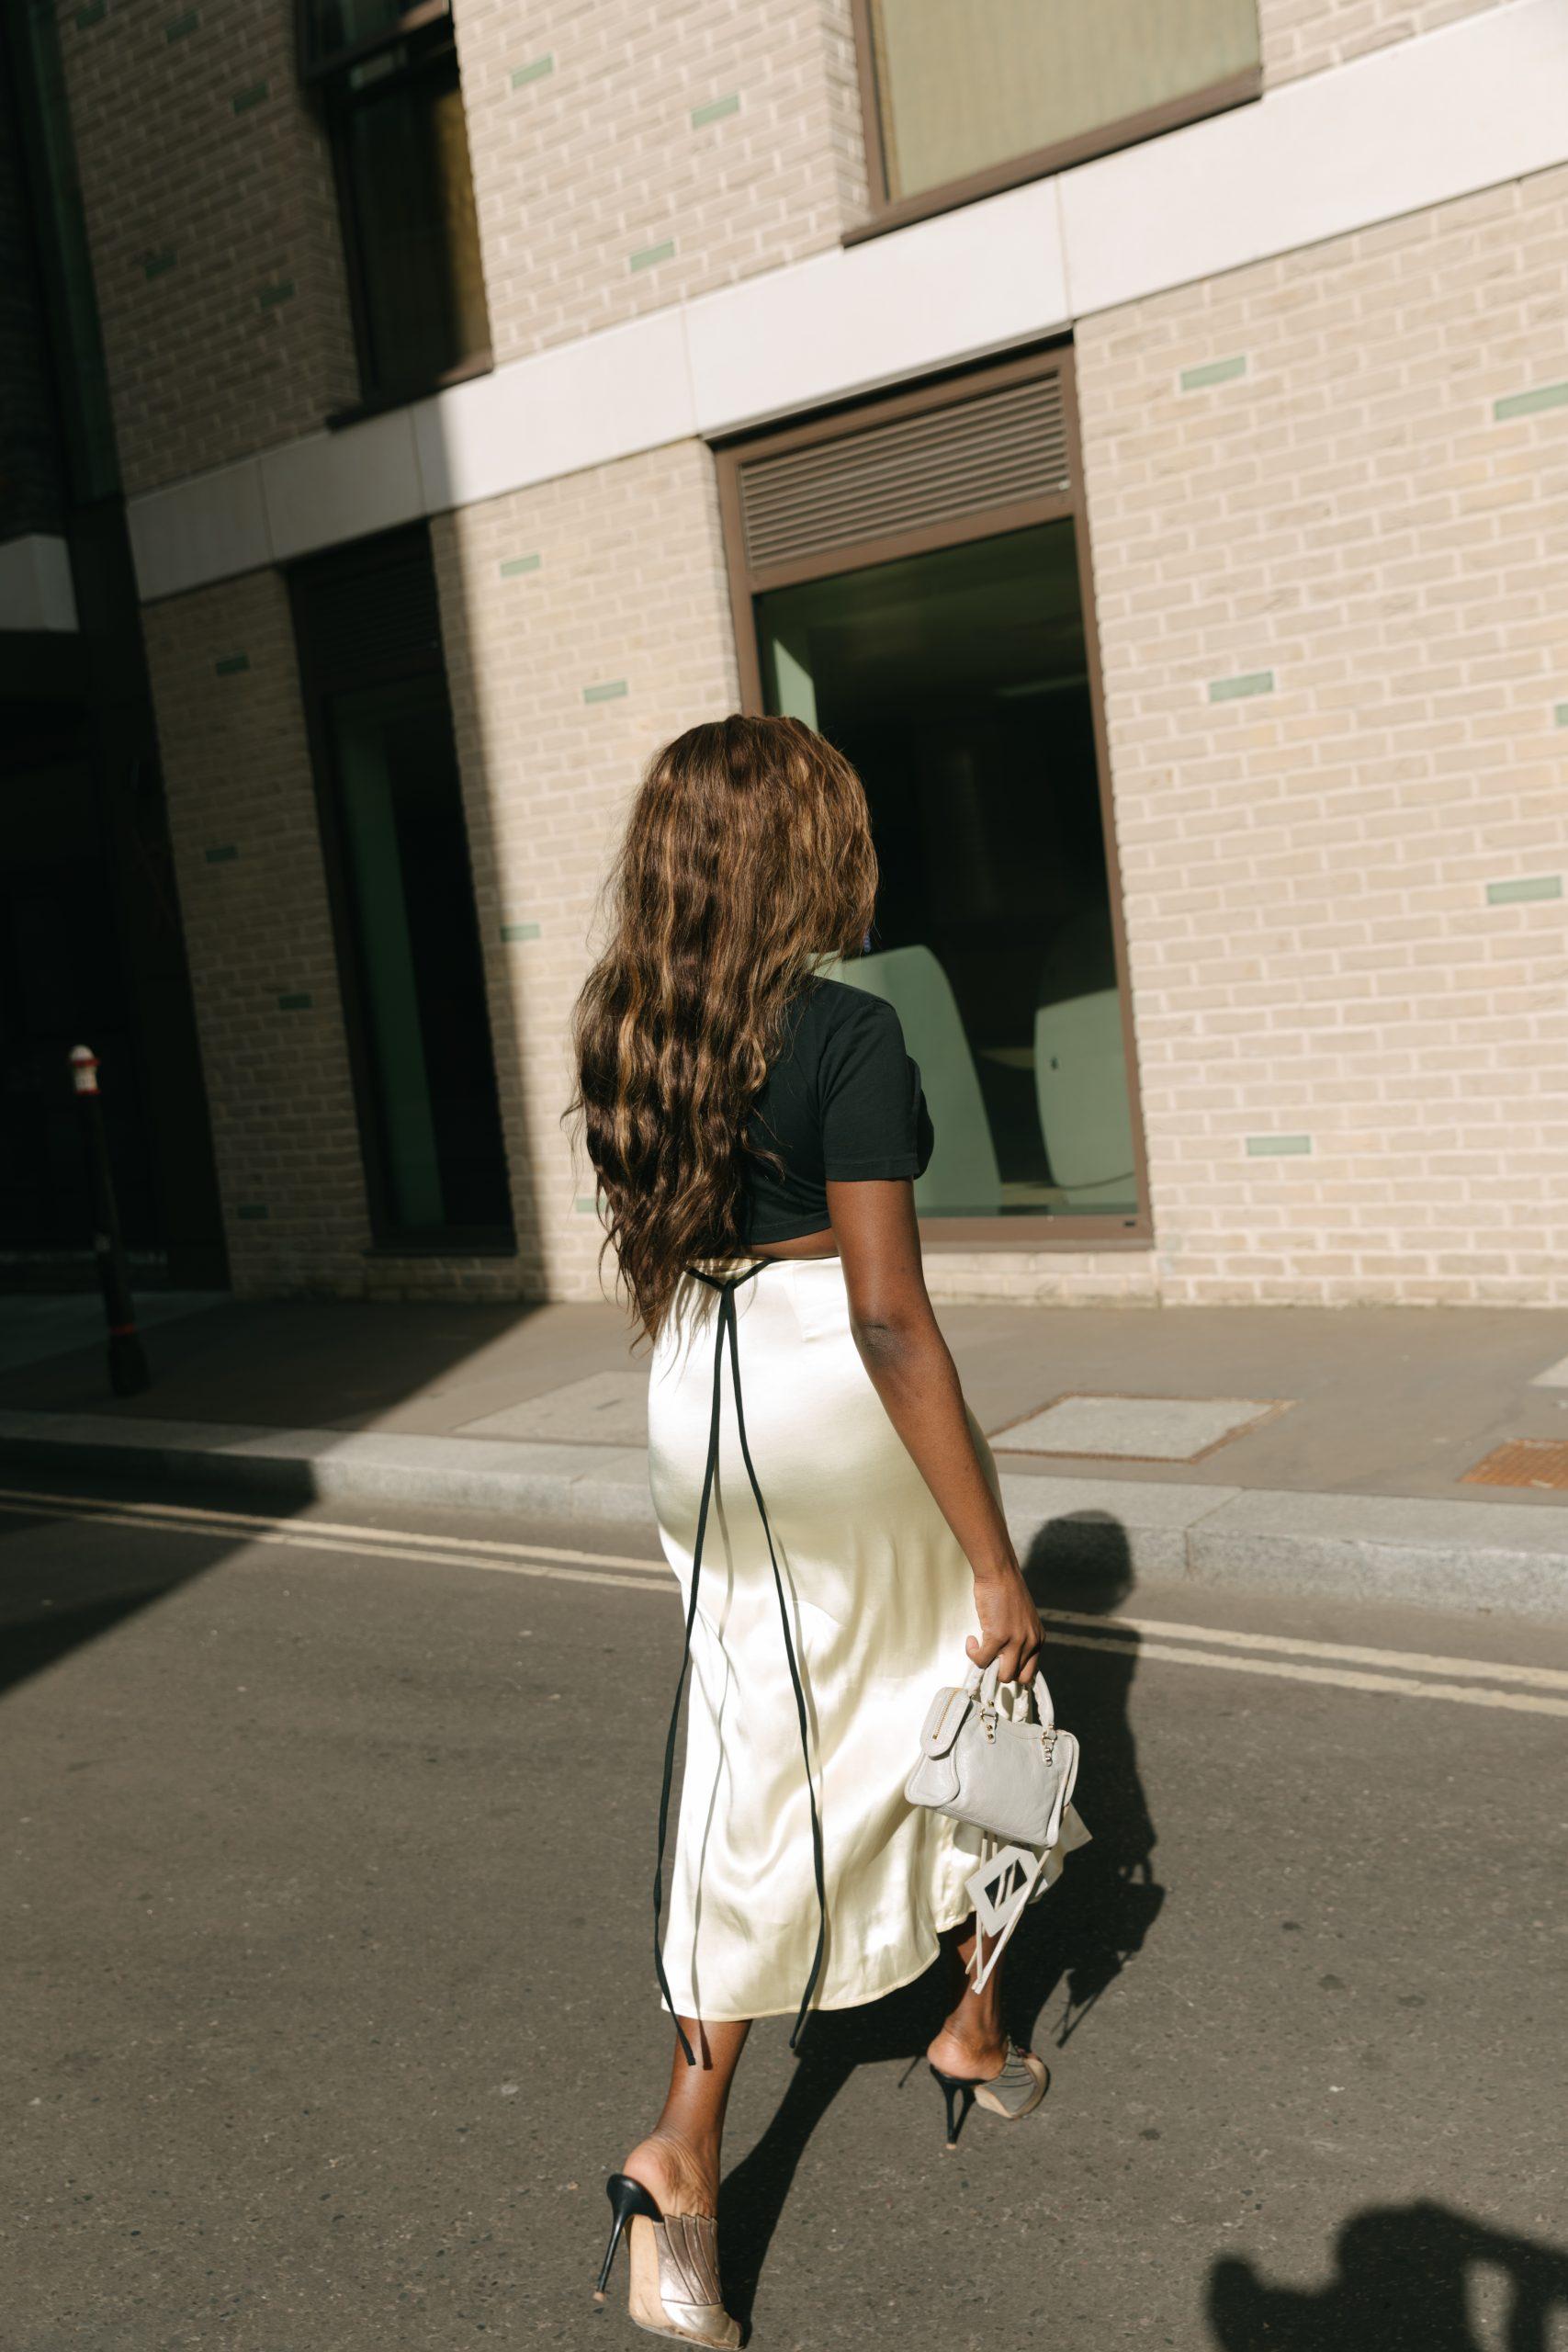 Jacquemus T-Shirt and Crop Top - Zara Satin midi skirt - Balenciaga mini city bag - back view walking -Tasha Antwi